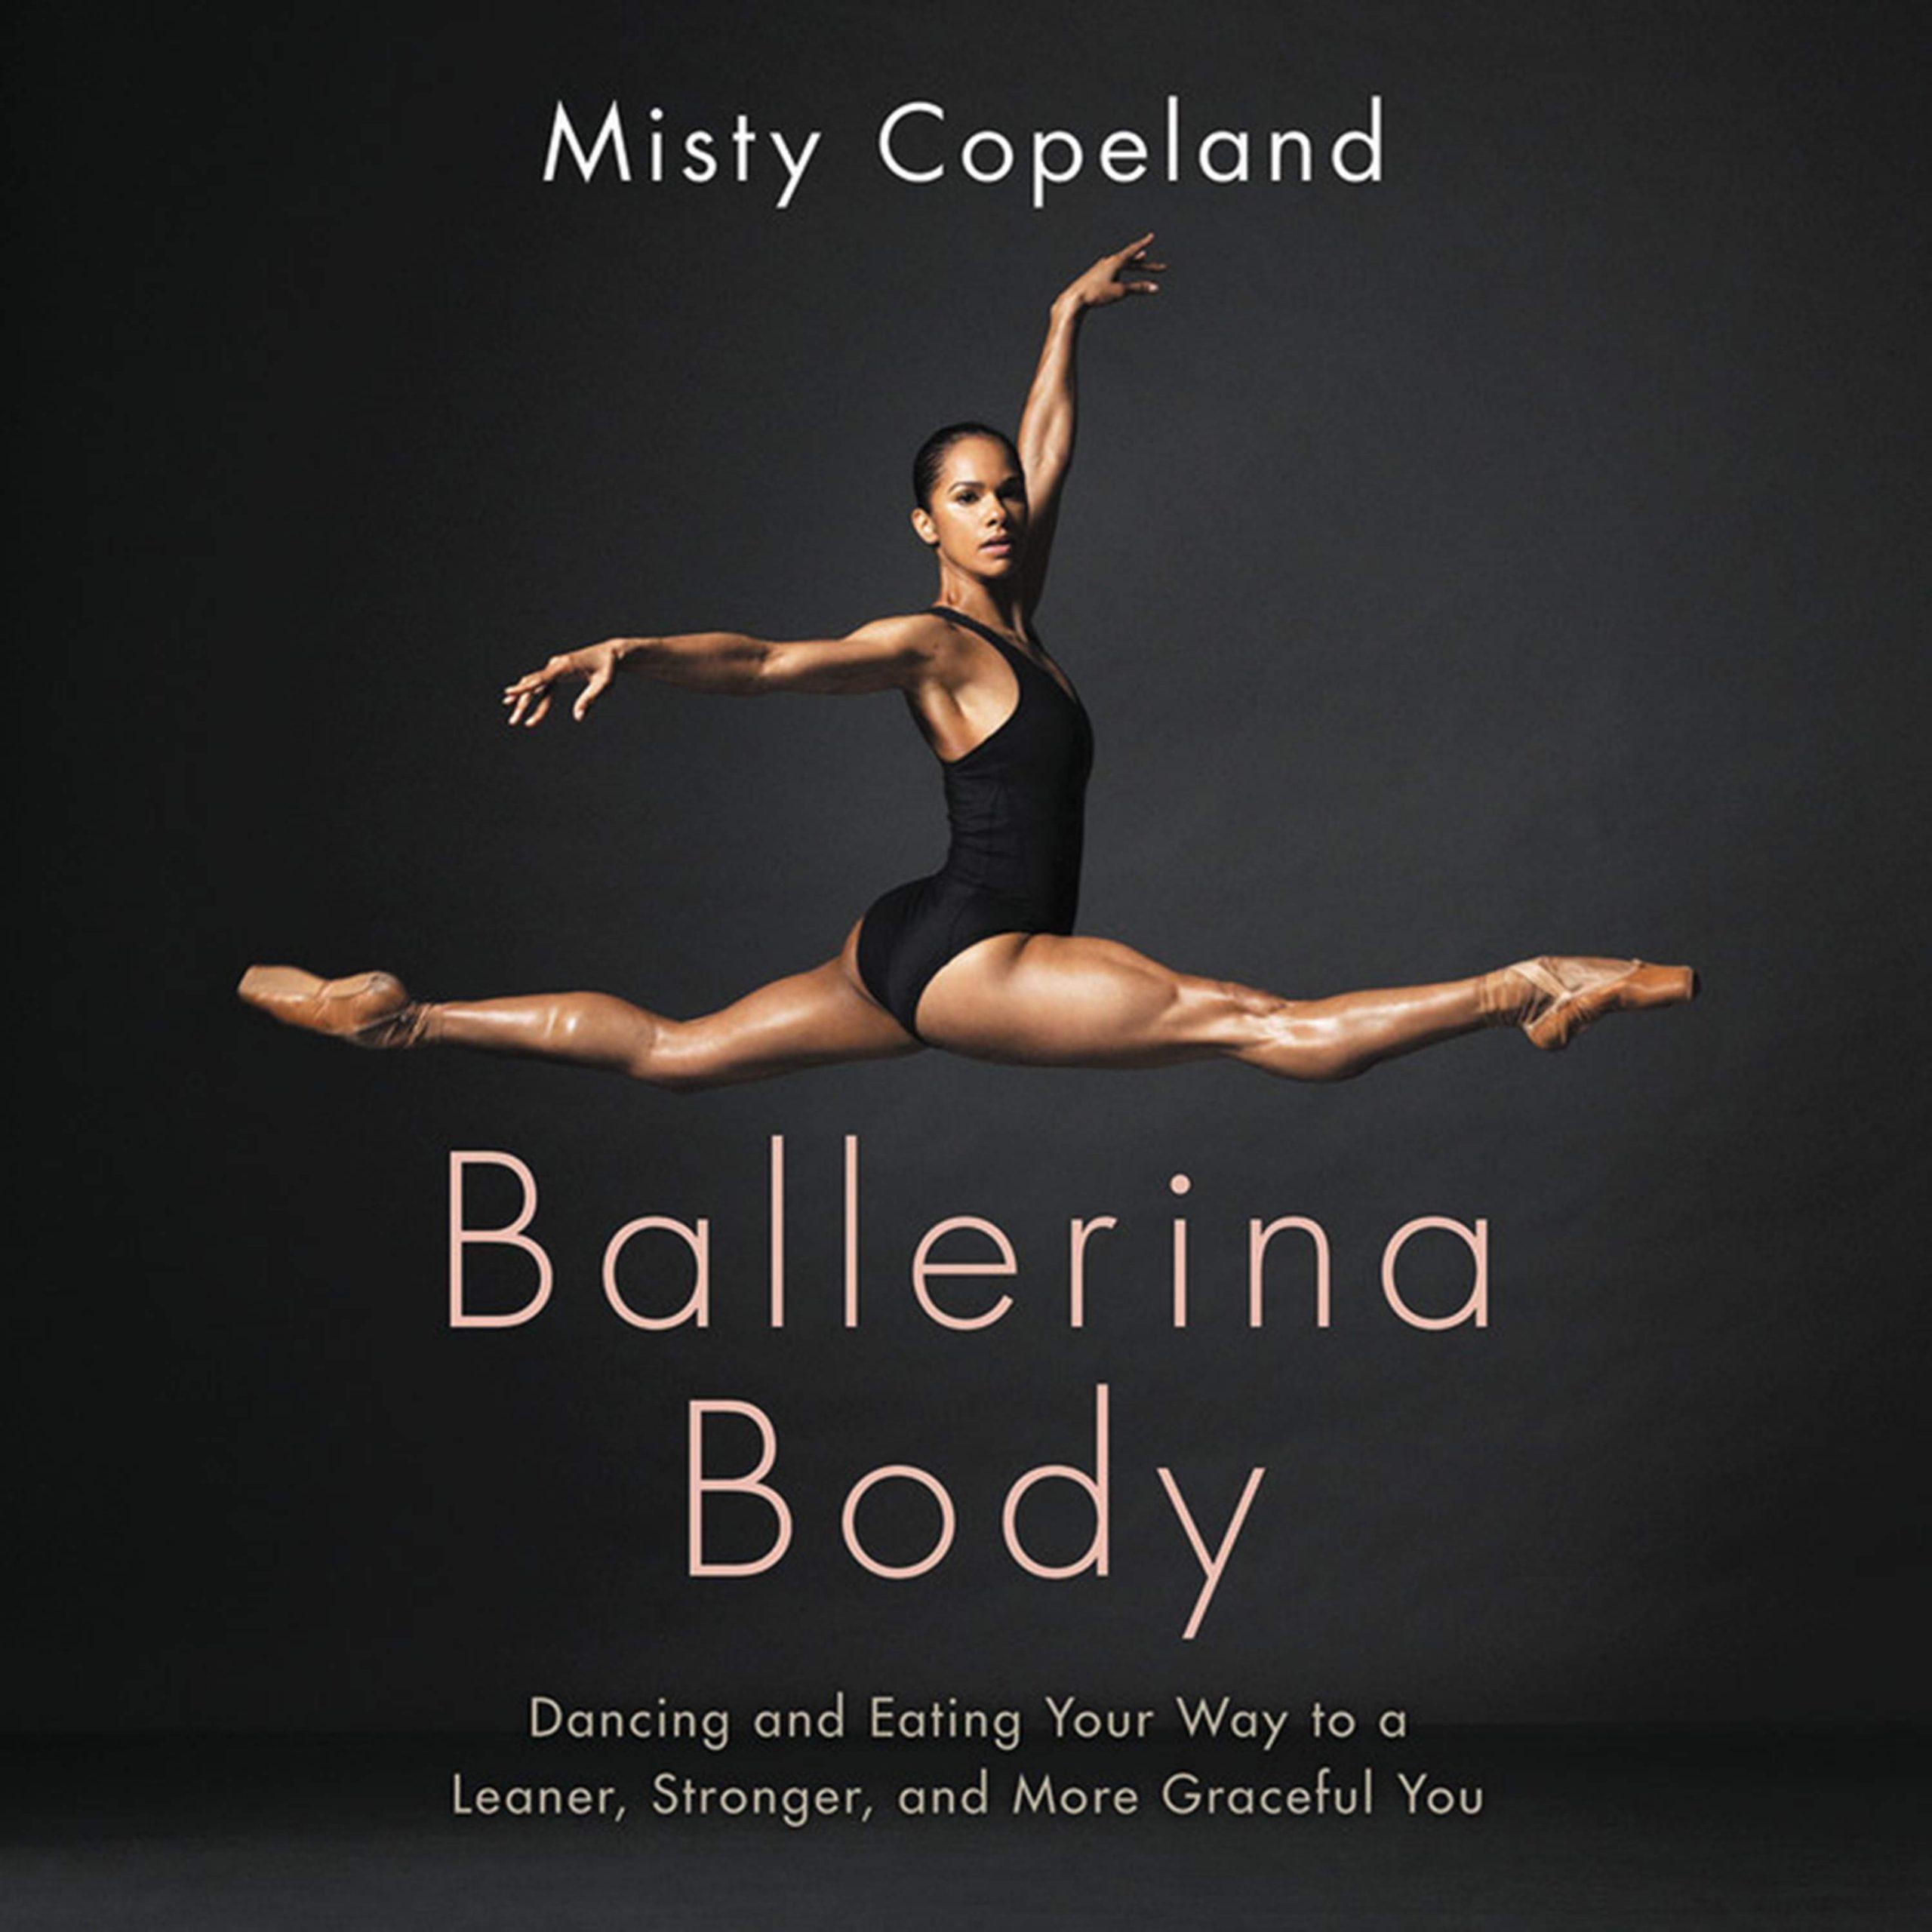 ballerina body misty copeland